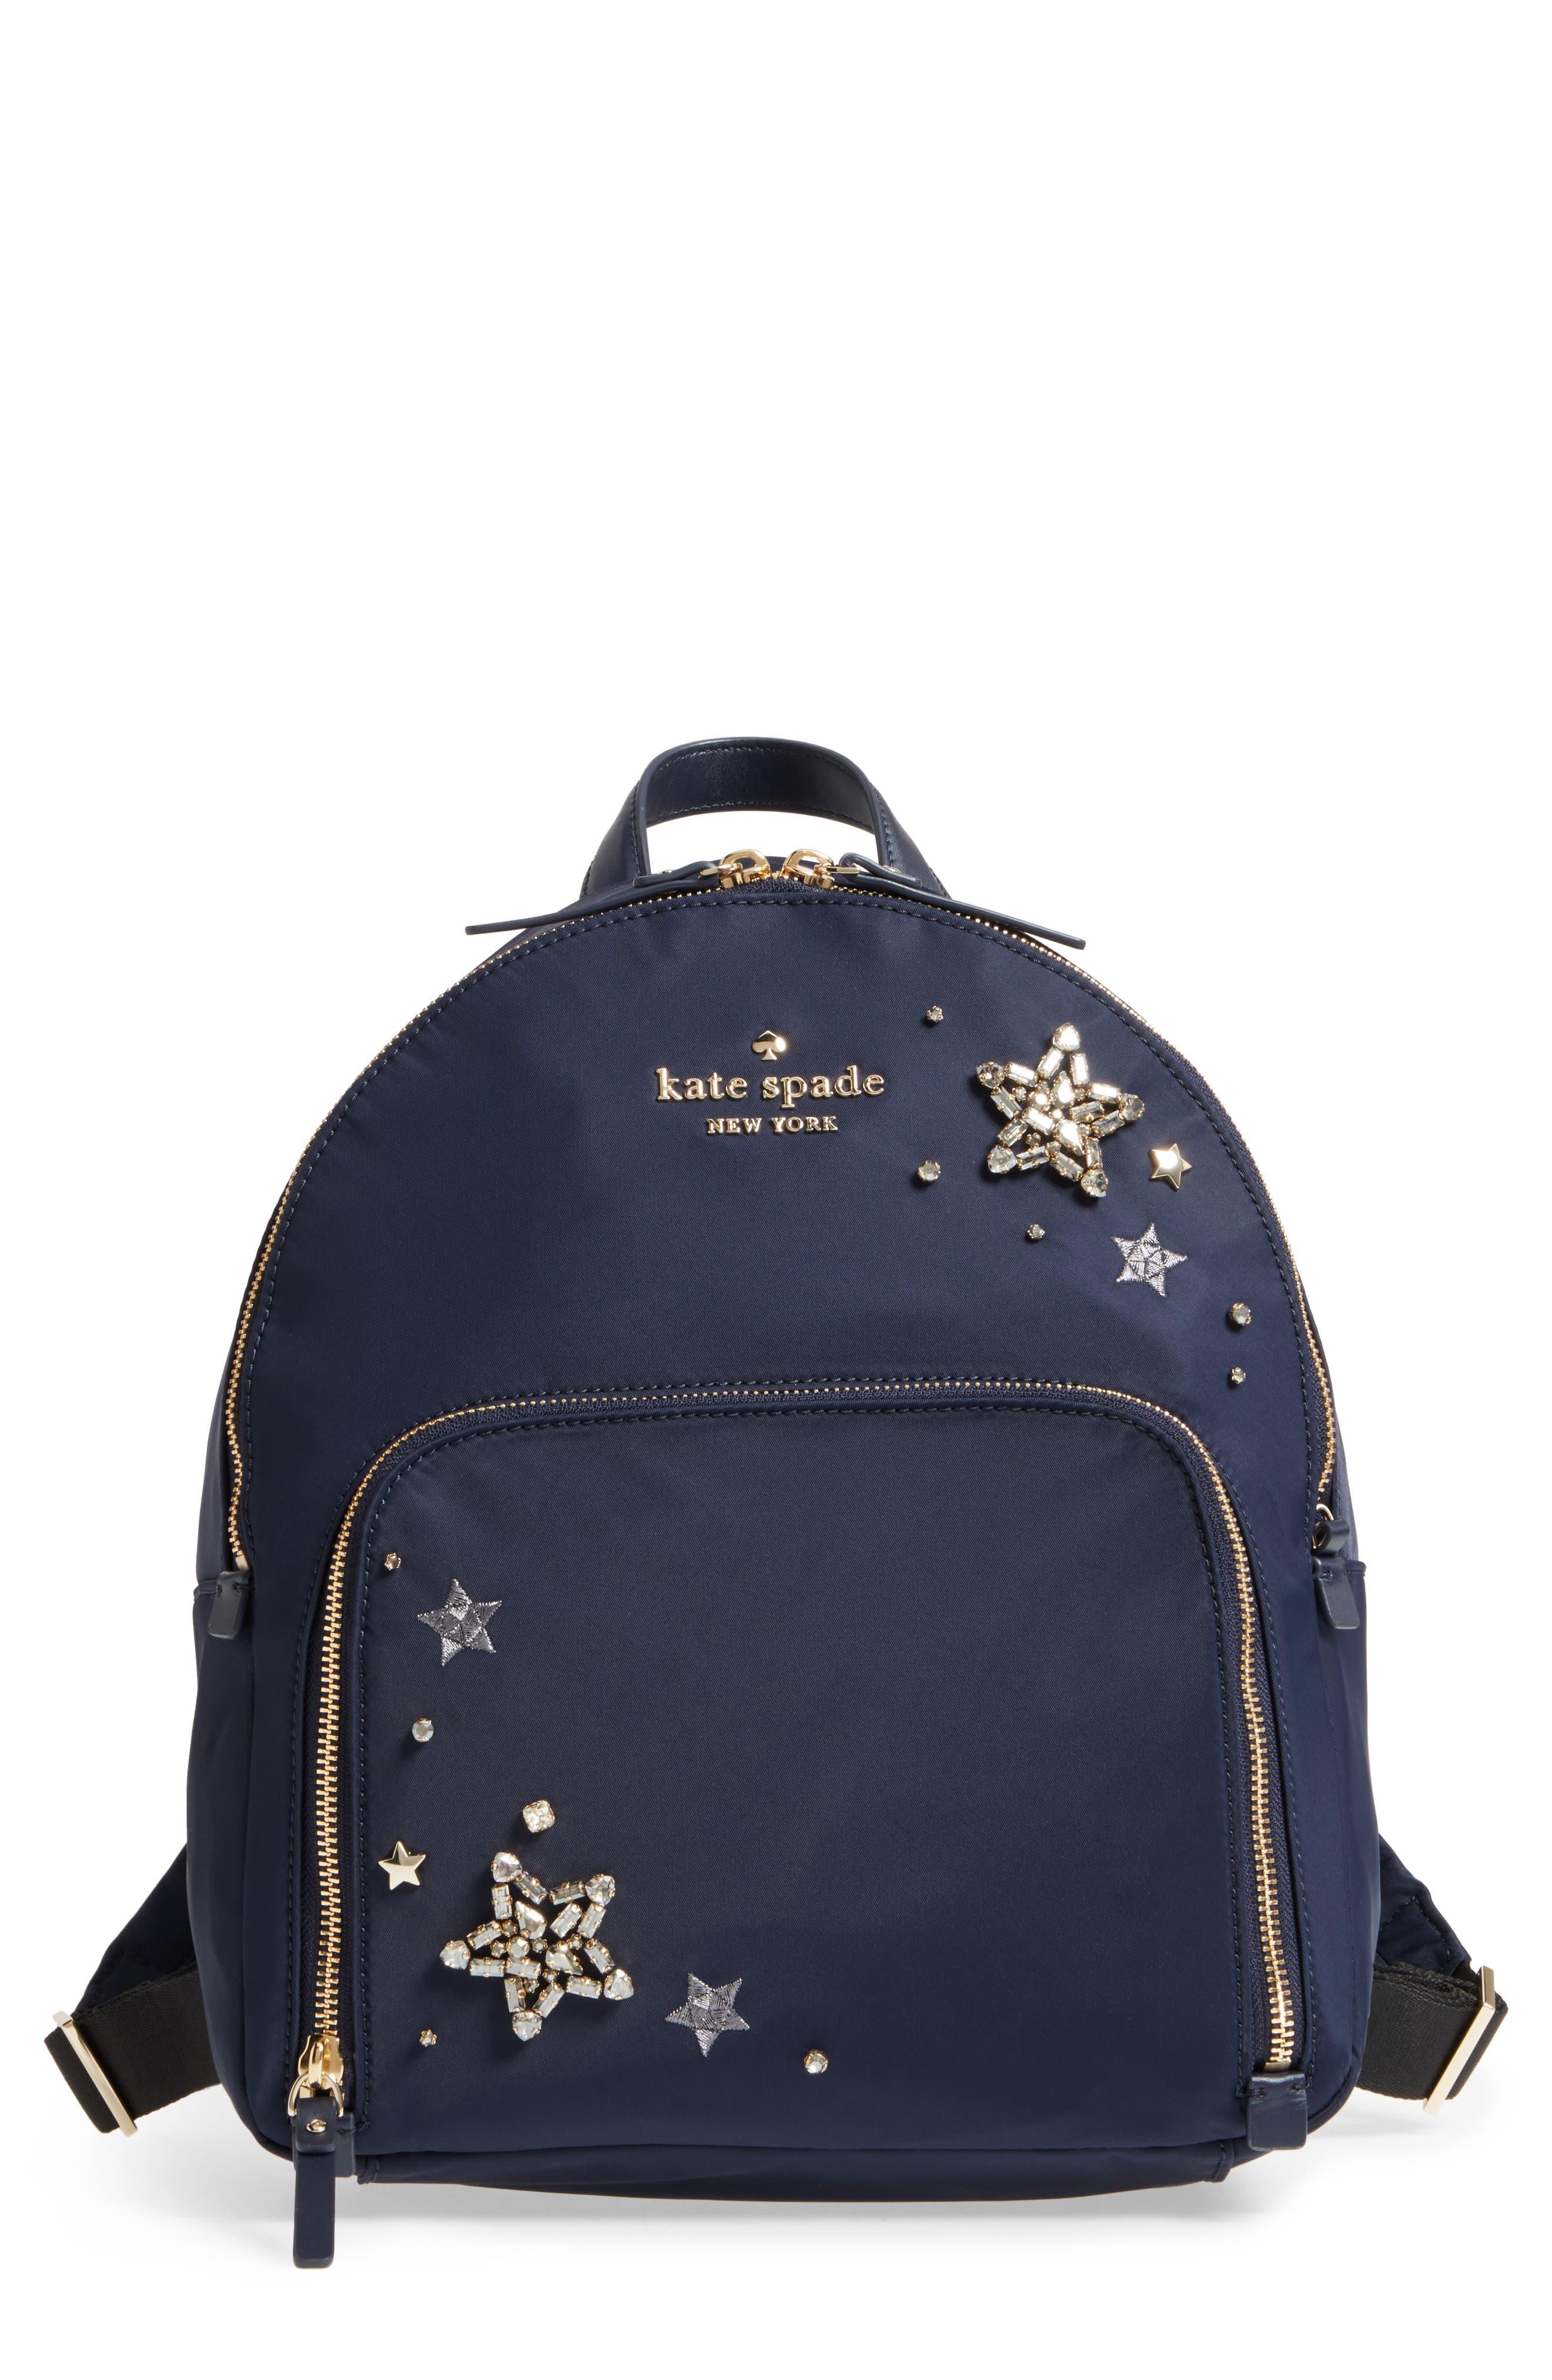 kate spade new york watson lane - hartley embellished nylon backpack